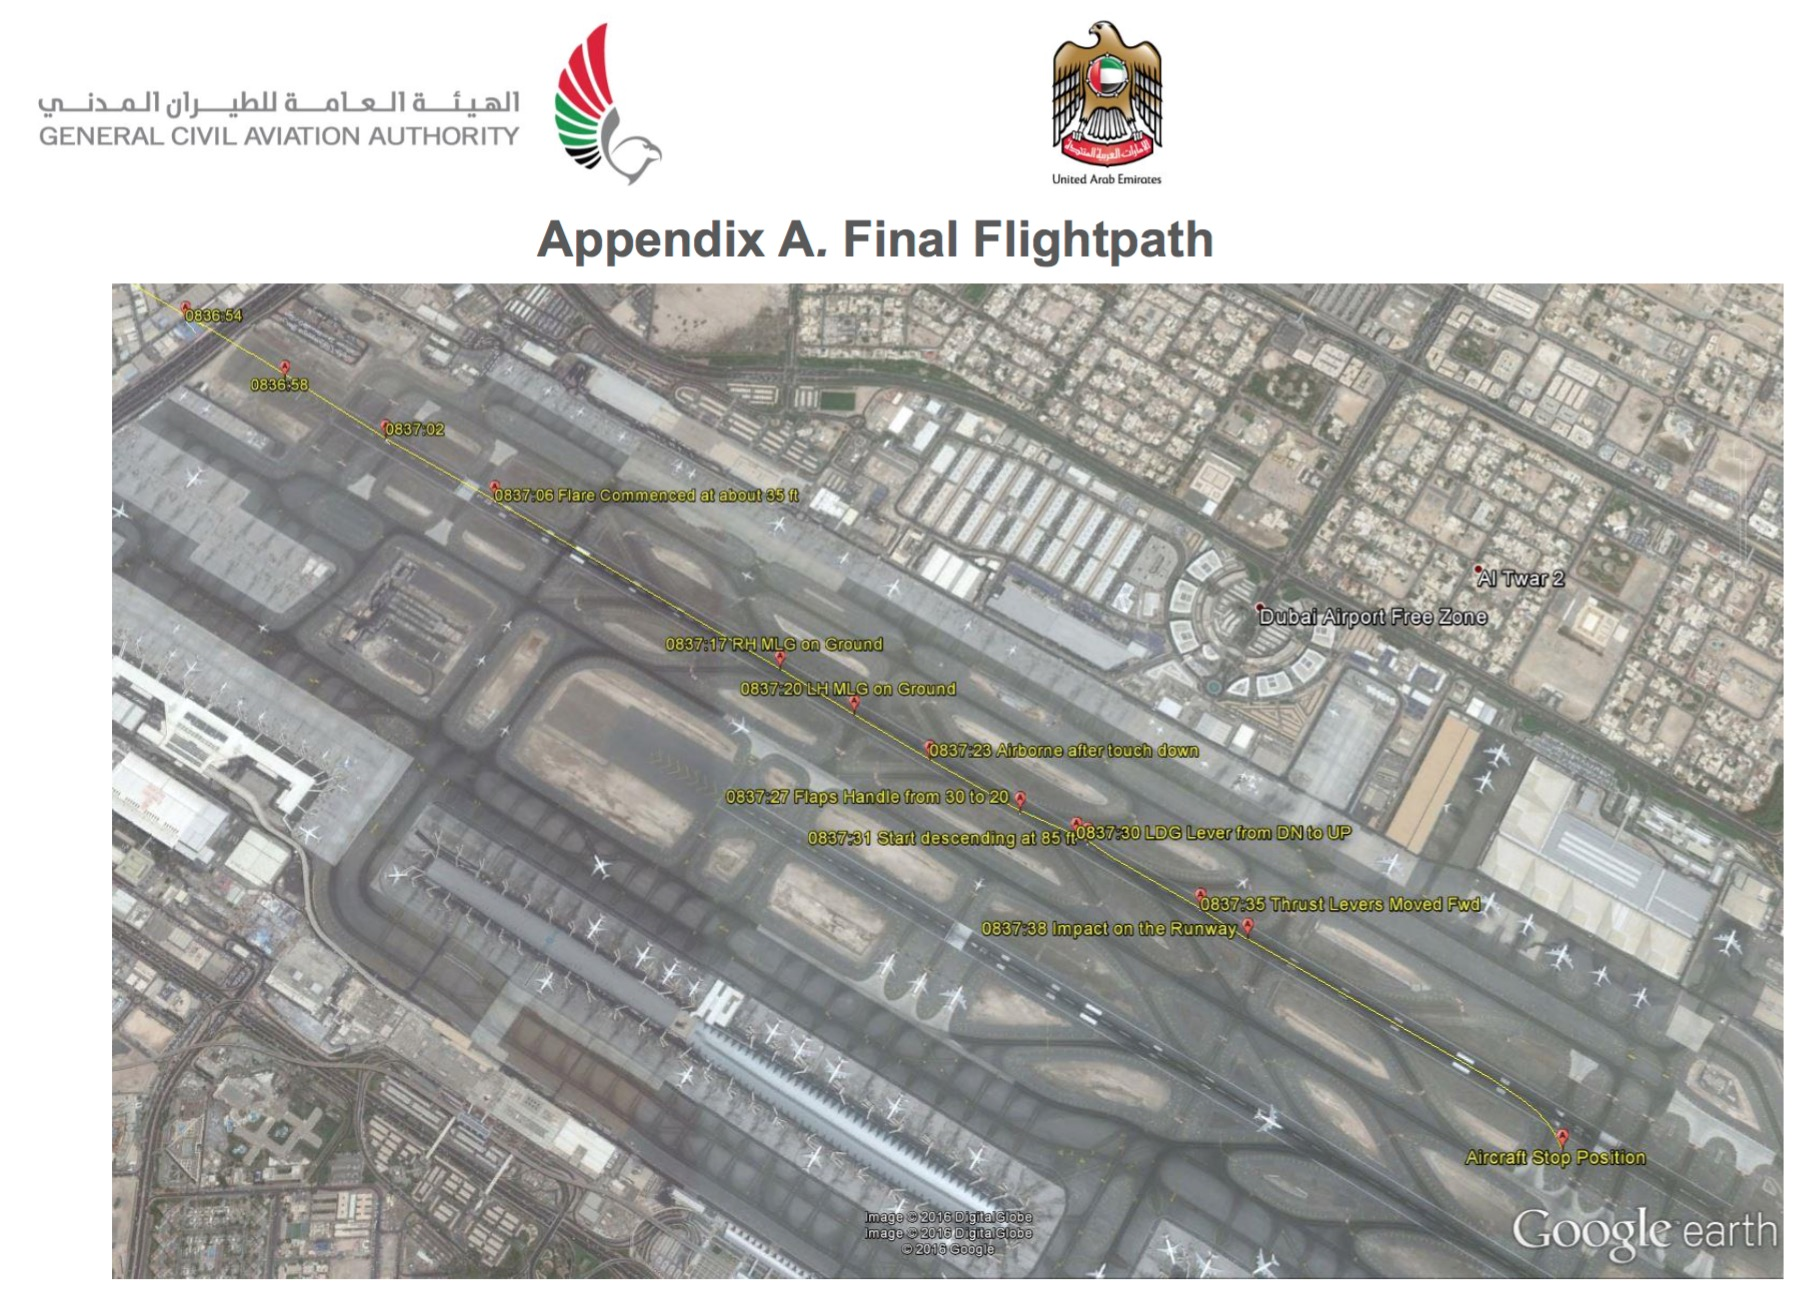 Flightpath of EK521. Image: GCAA Report